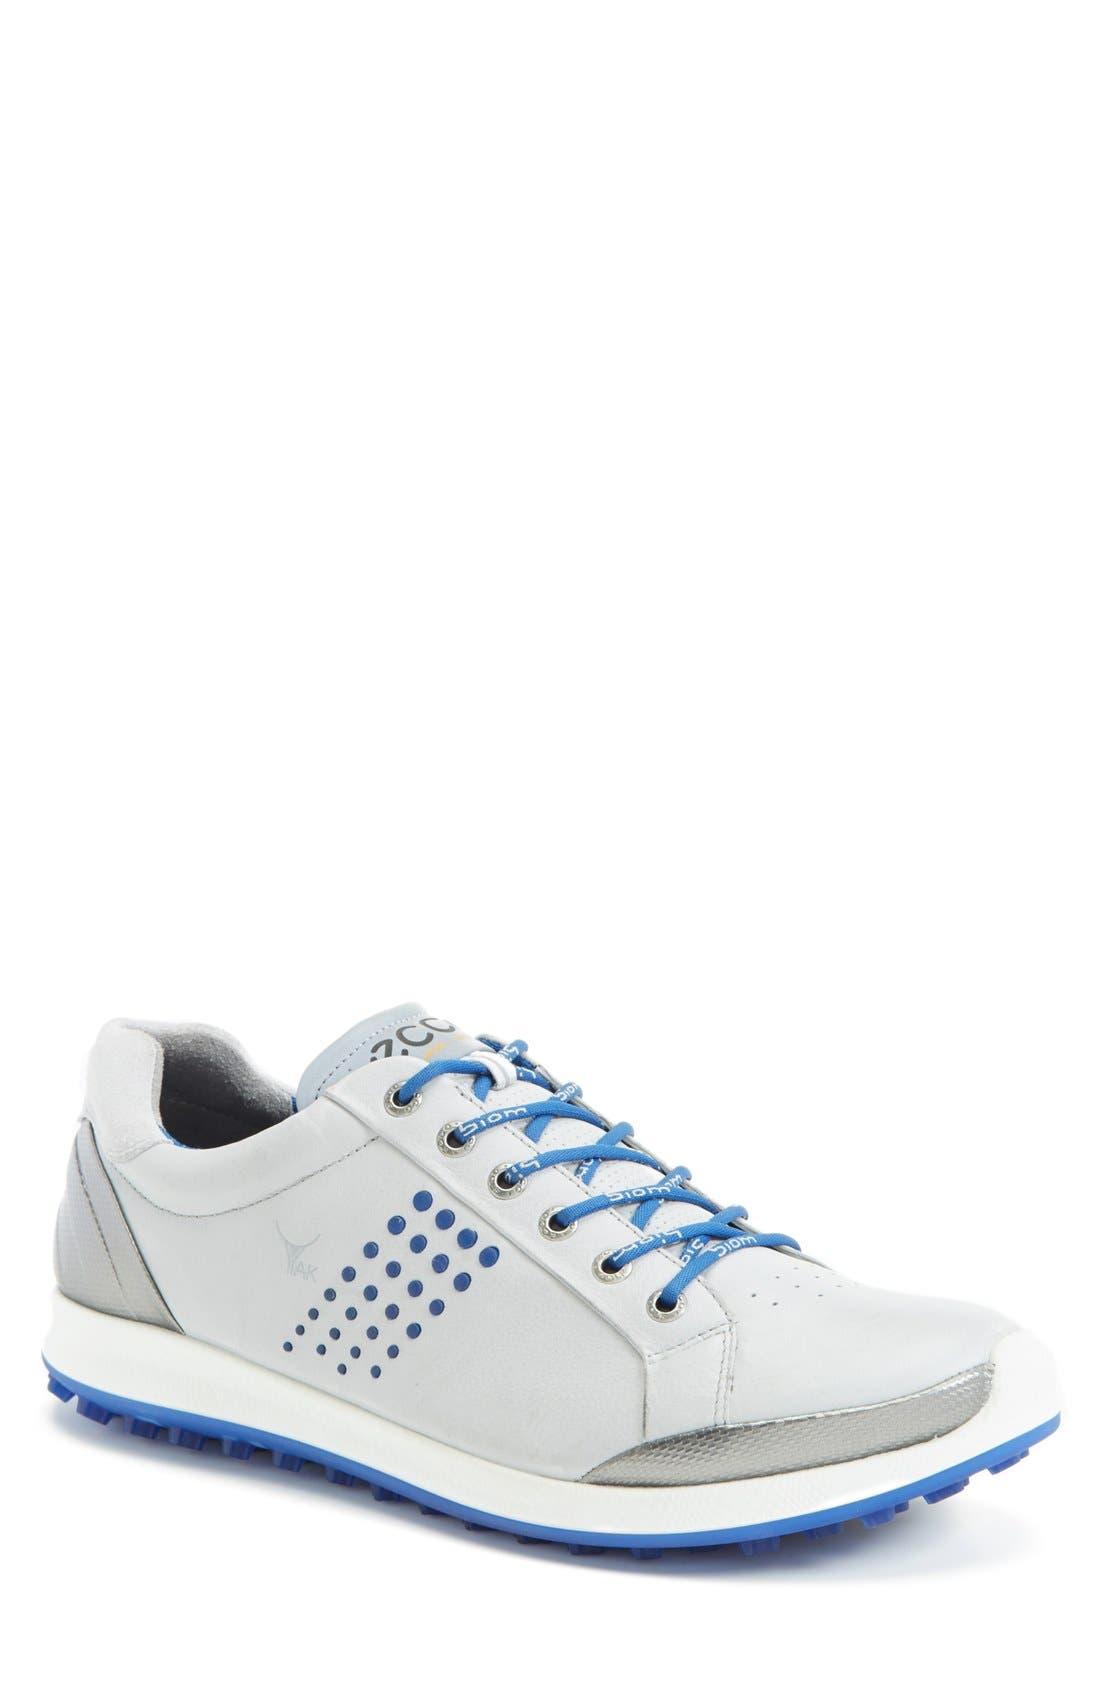 Main Image - ECCO BIOM Hybrid 2 Golf Shoe (Men). Color: Concrete/ Royal